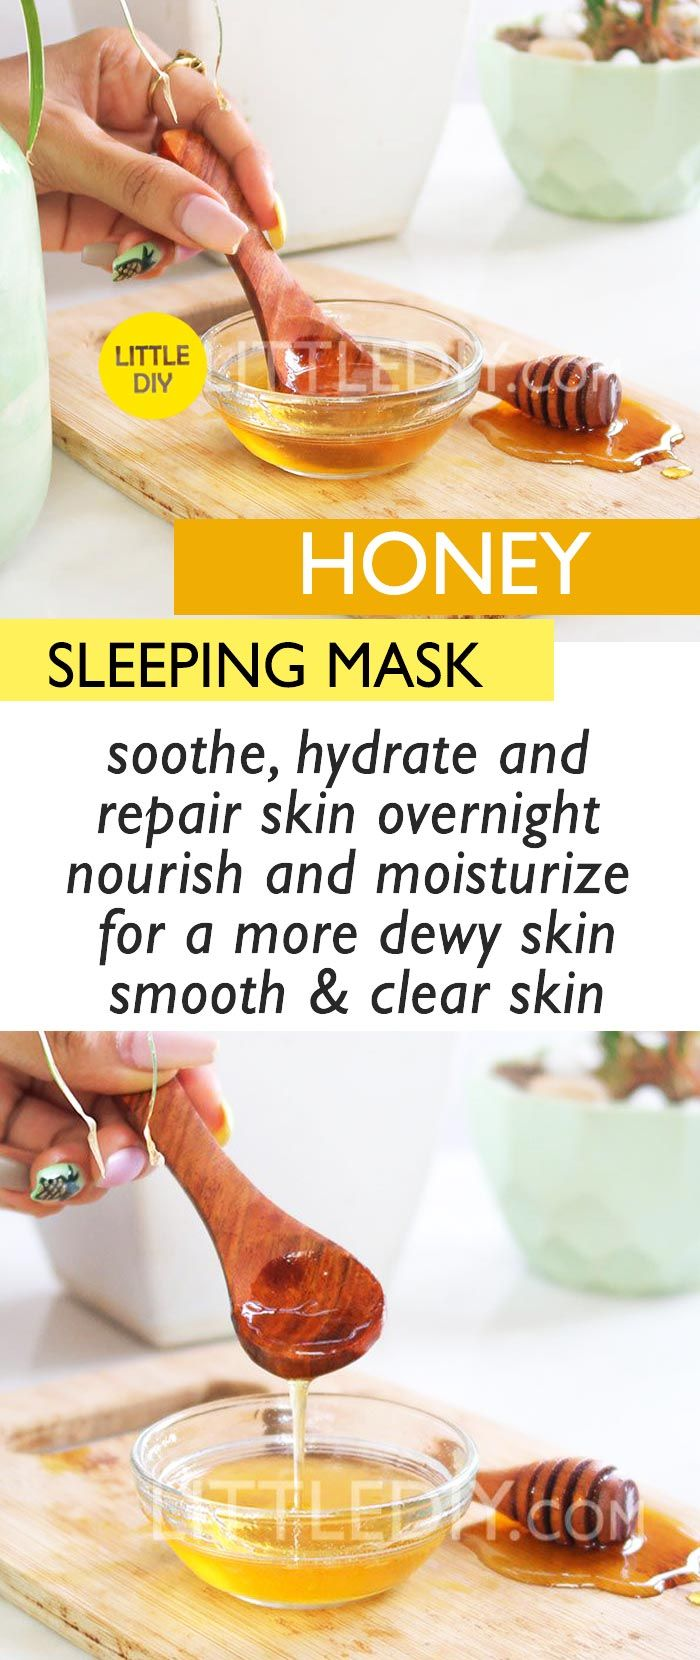 MOISTURIZING HONEY SLEEPING MASK Mask for dry skin, Face